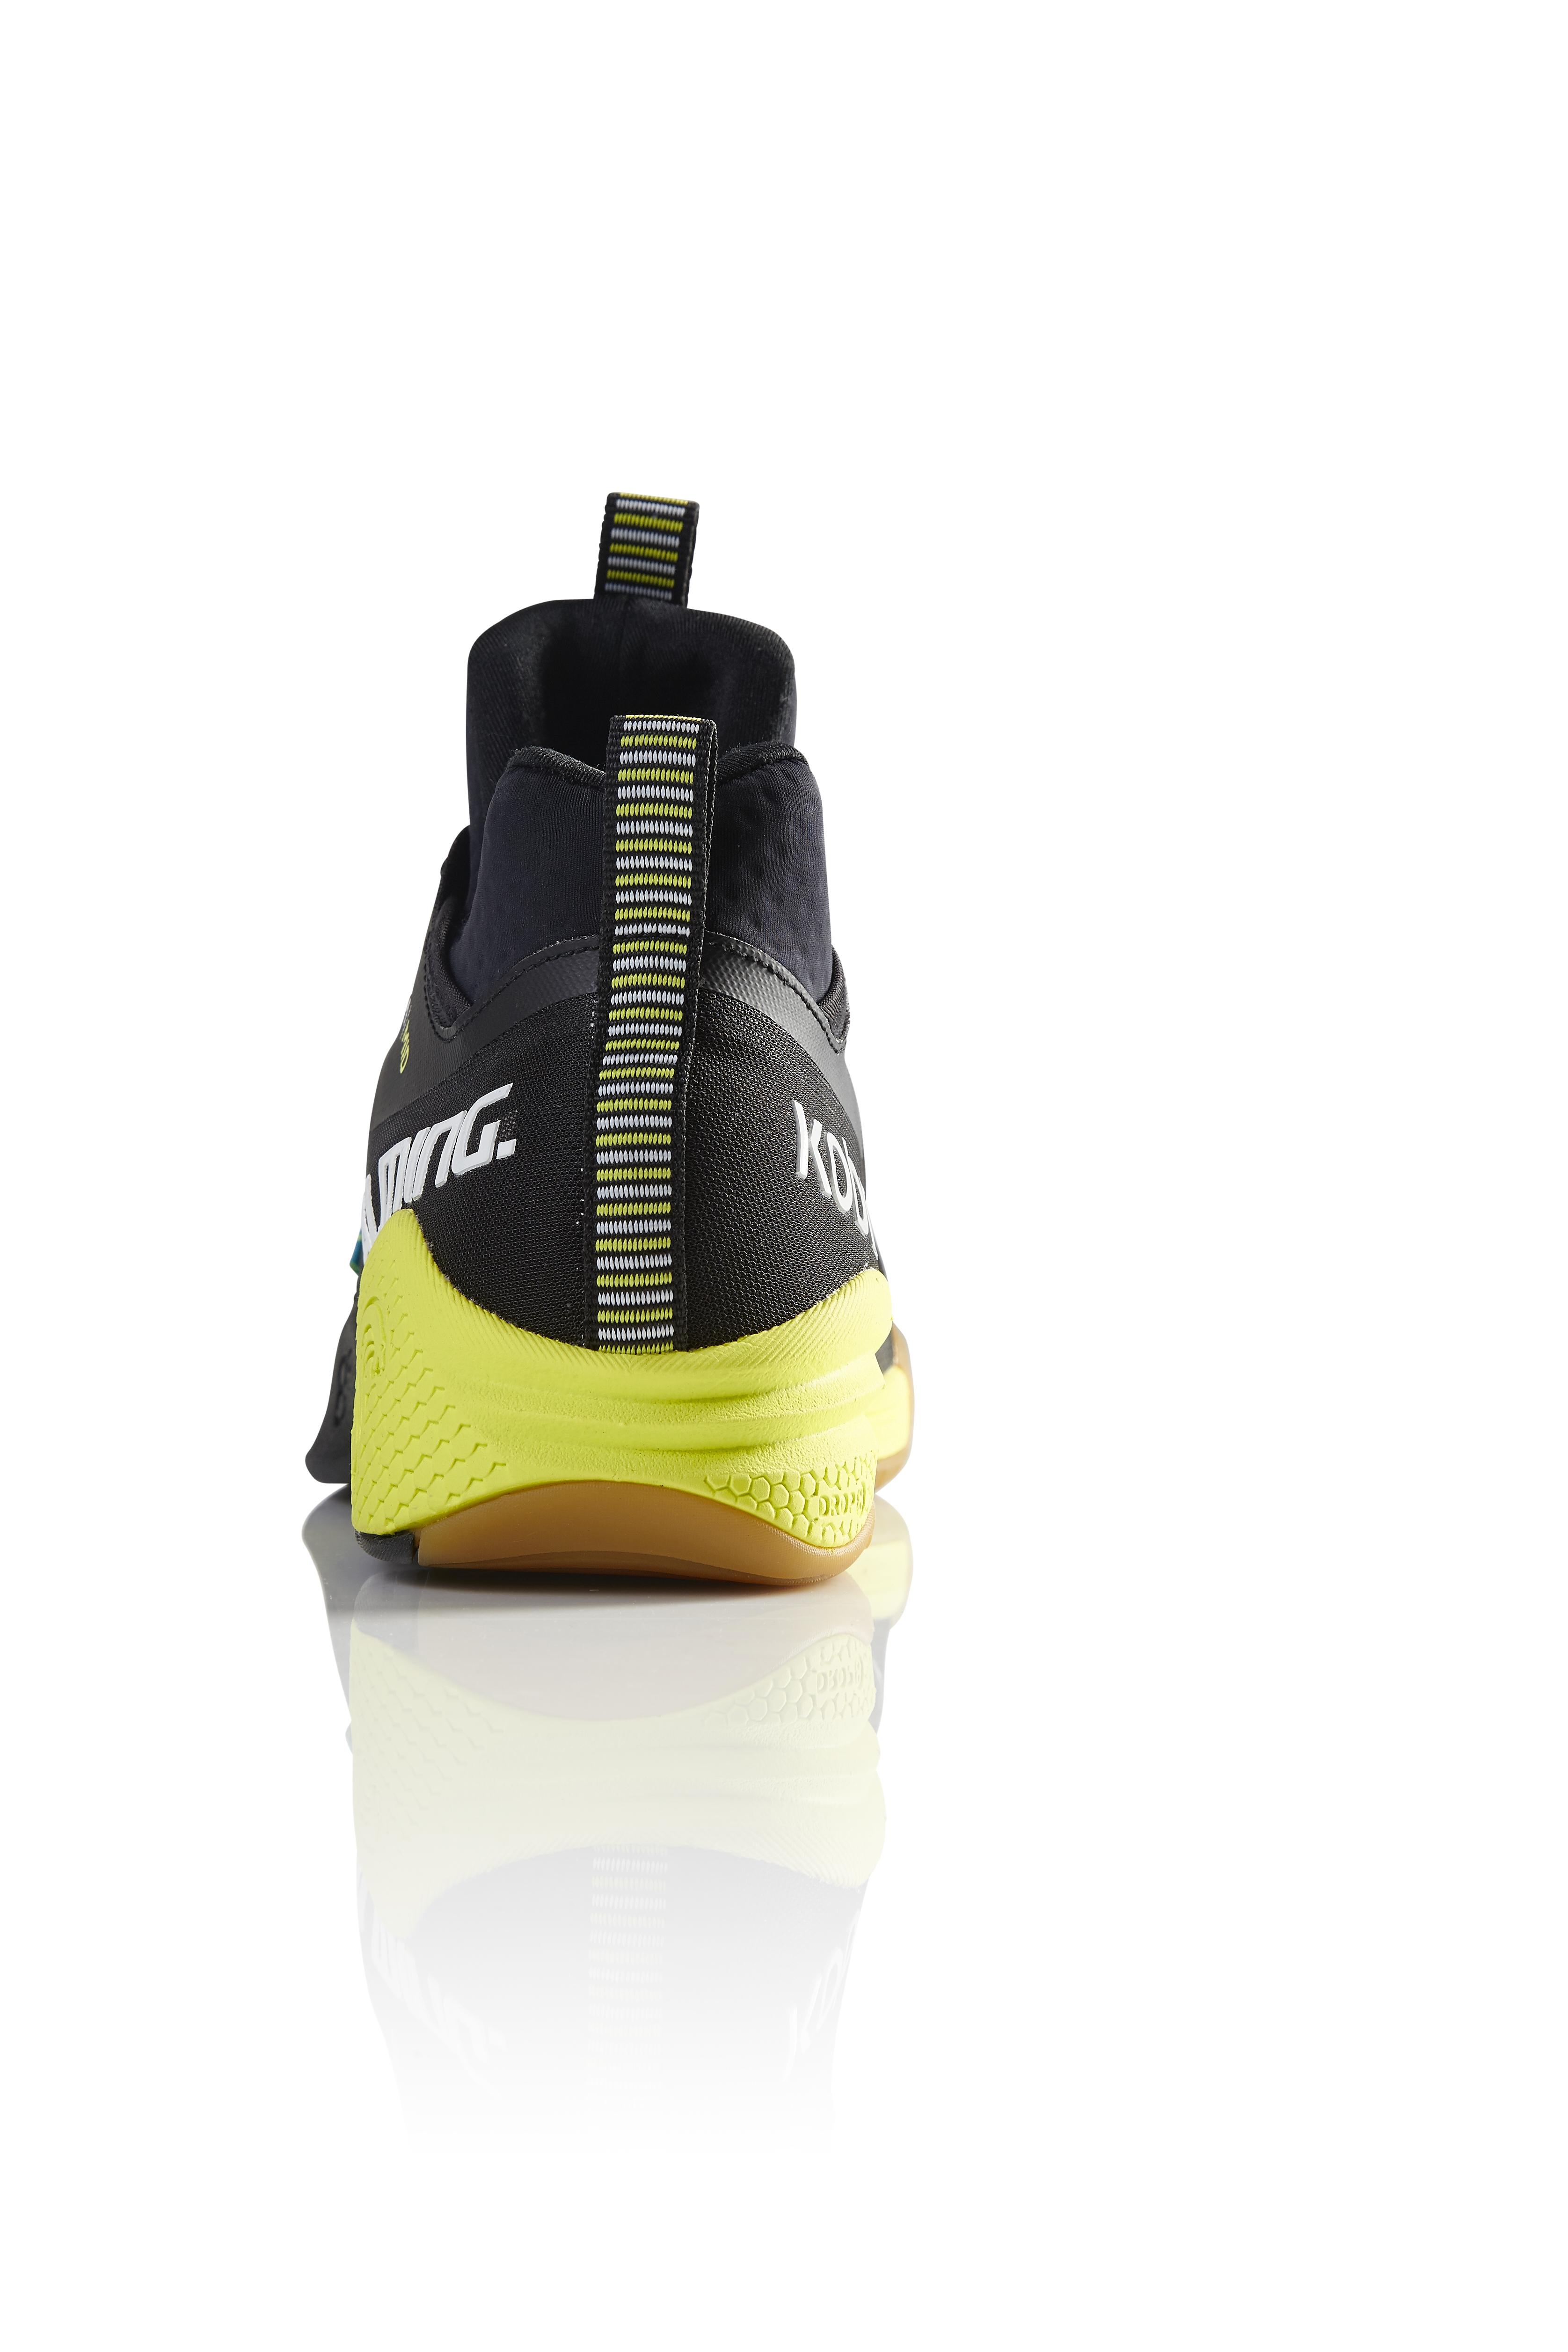 https://www.athleteshop.de/salming-kobra-mid-handball-shoes-black-yellow-12-5?utm_source=tradetracker&utm_medium=cps&utm_campaign=FeedDE